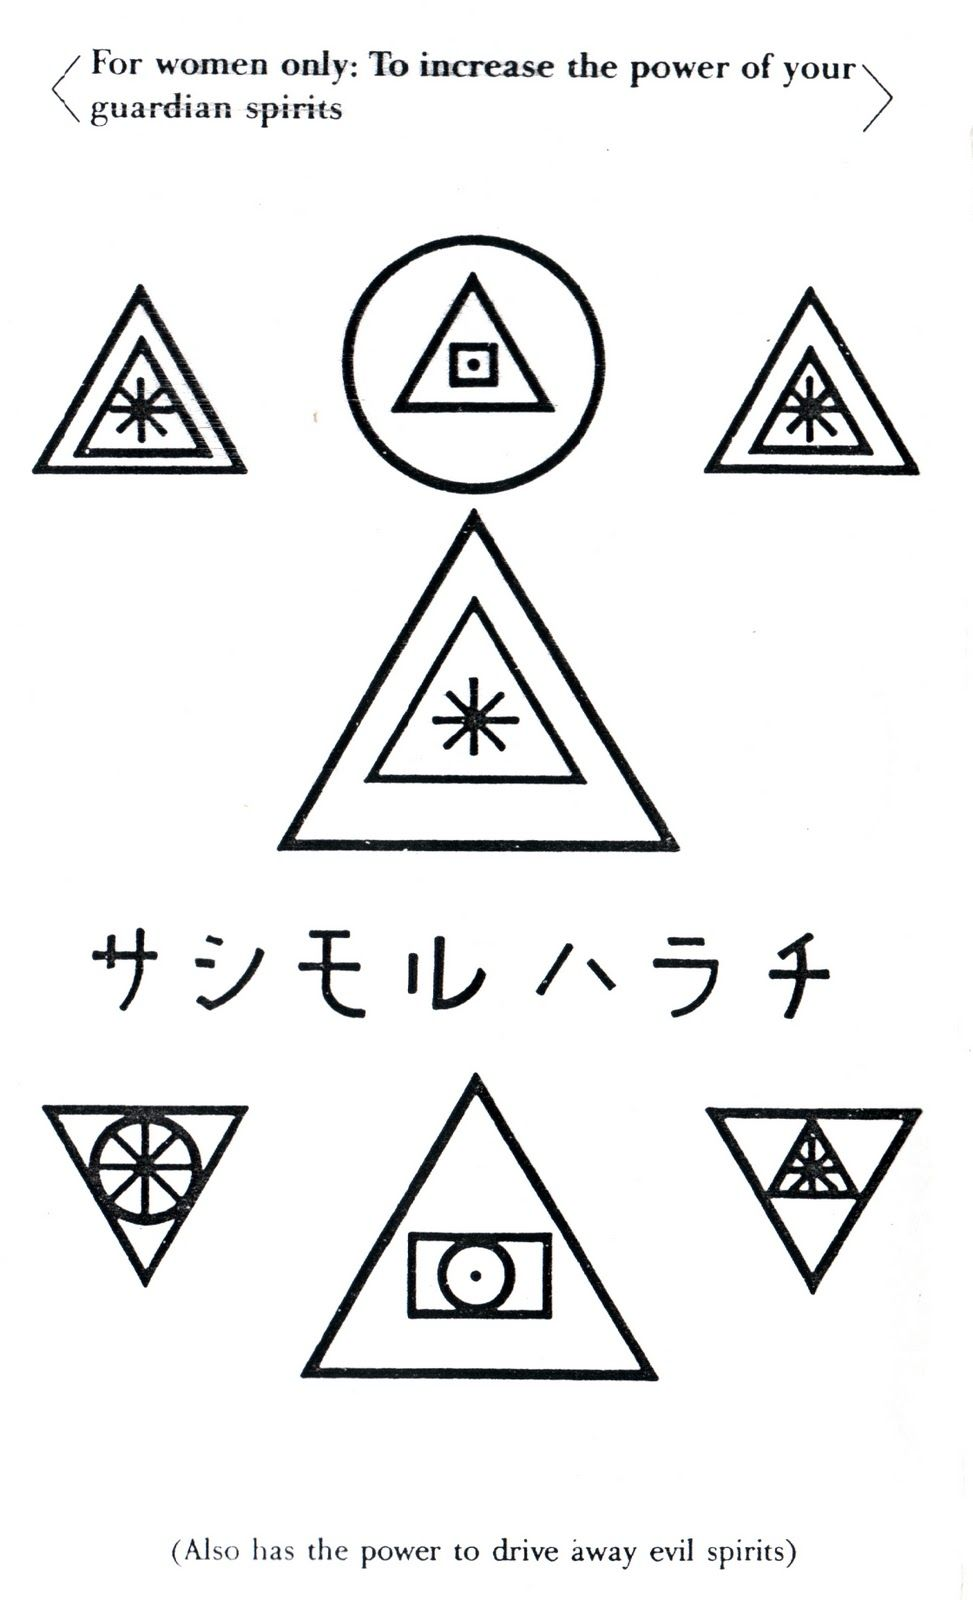 Protection symbols against evil spirits protection symbols protection symbols against evil spirits protection symbols against evil symbols pinterest symbols and tatting biocorpaavc Gallery